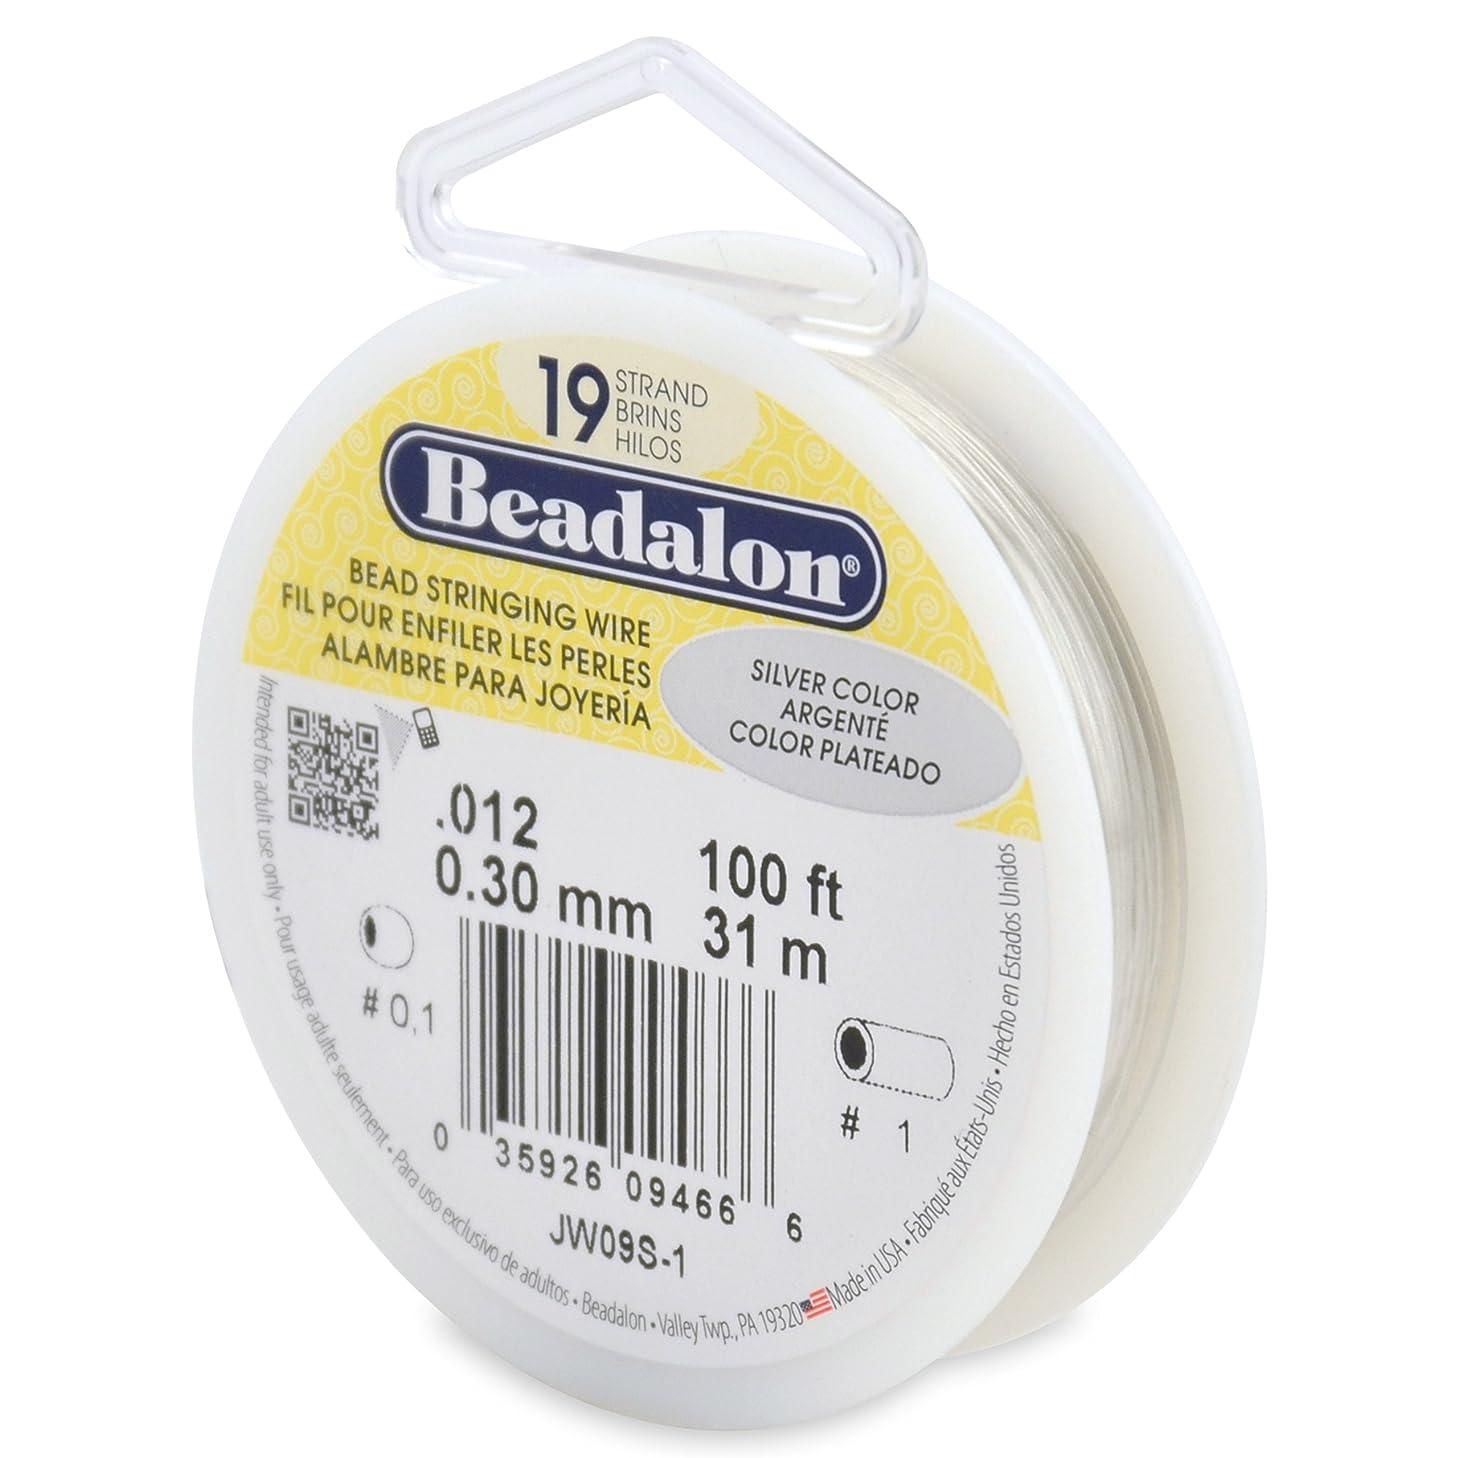 Beadalon 19-Strand Bead Stringing Wire, 0.012-Inch, Silver Color, 100-Feet